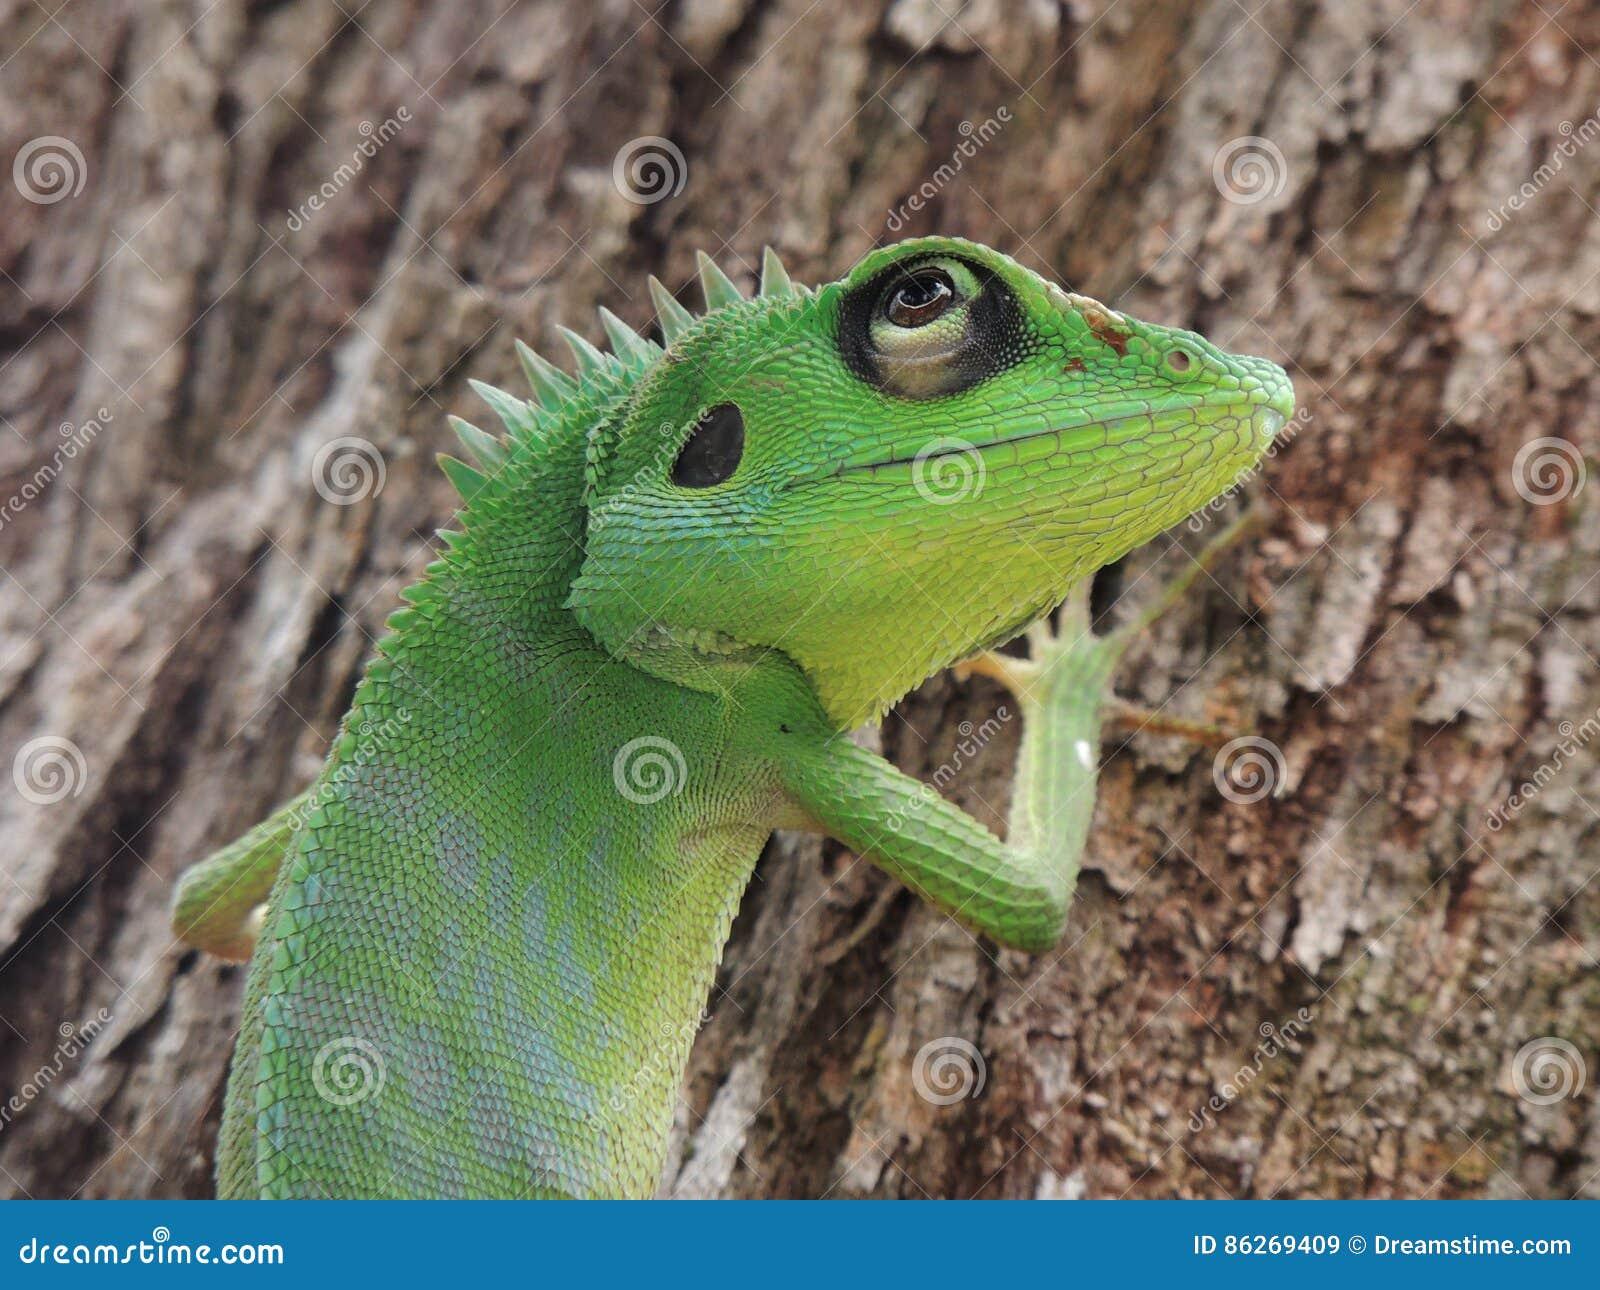 Lagarto con cresta verde